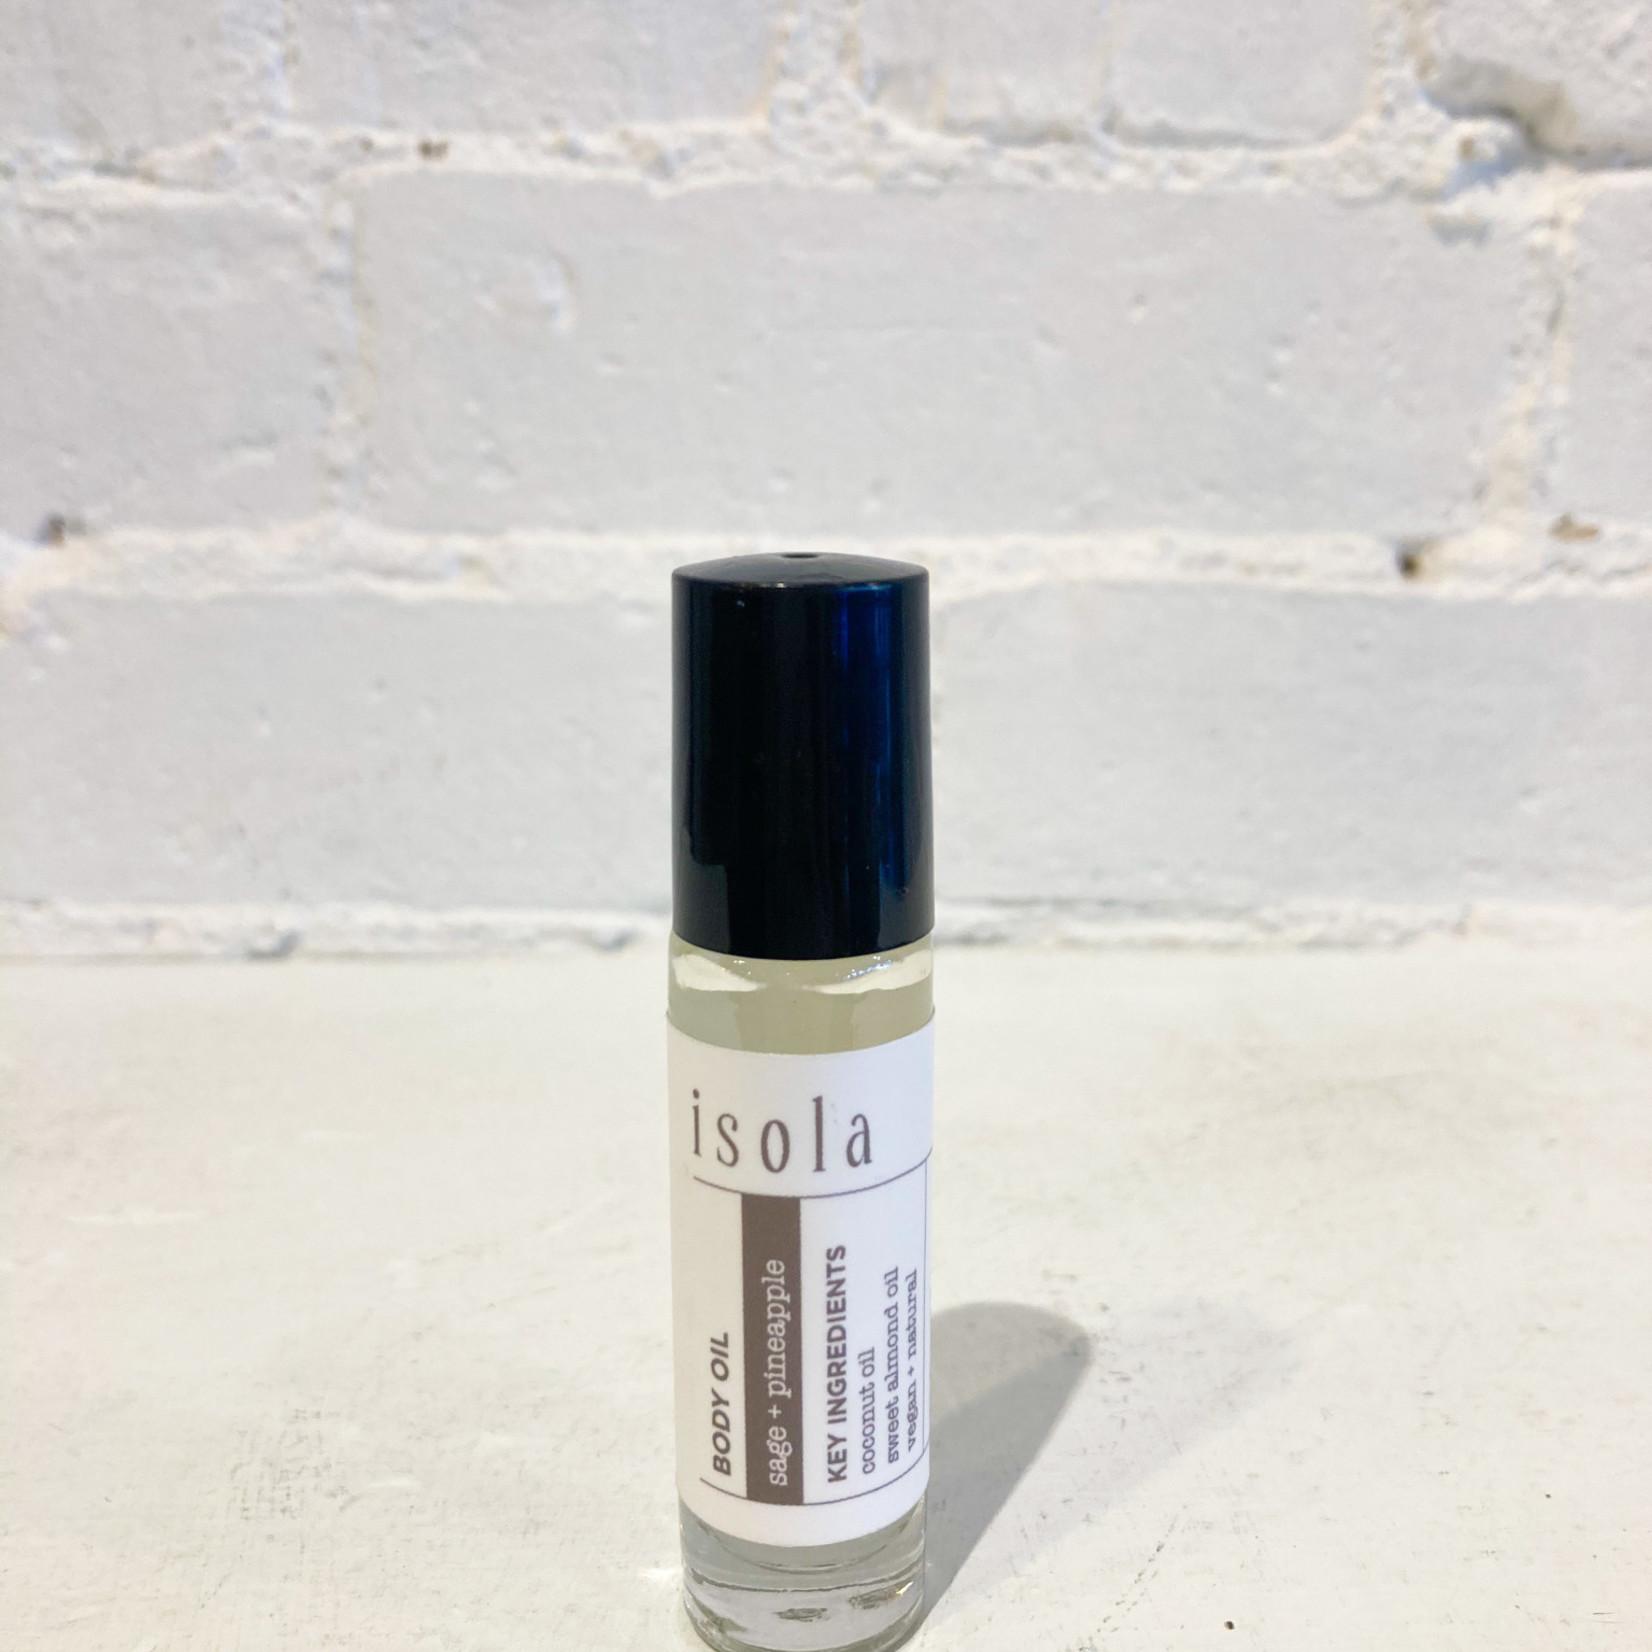 Isola Isola Body Oil- Sage + Pineapple